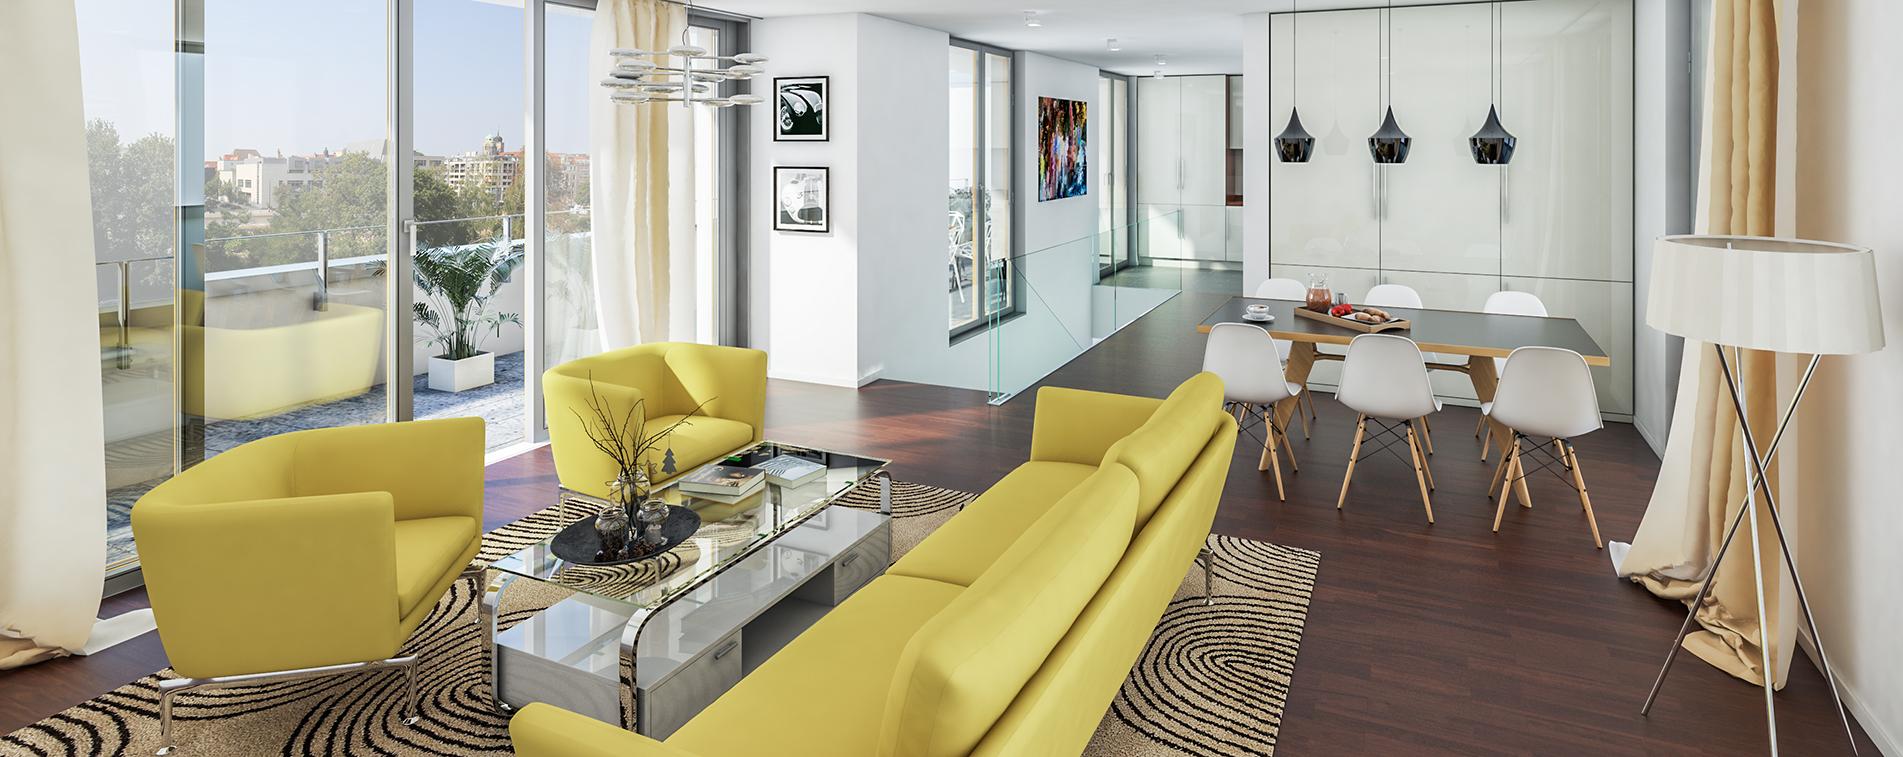 ausstattung stadthaus leibniz 47 magdeburg. Black Bedroom Furniture Sets. Home Design Ideas